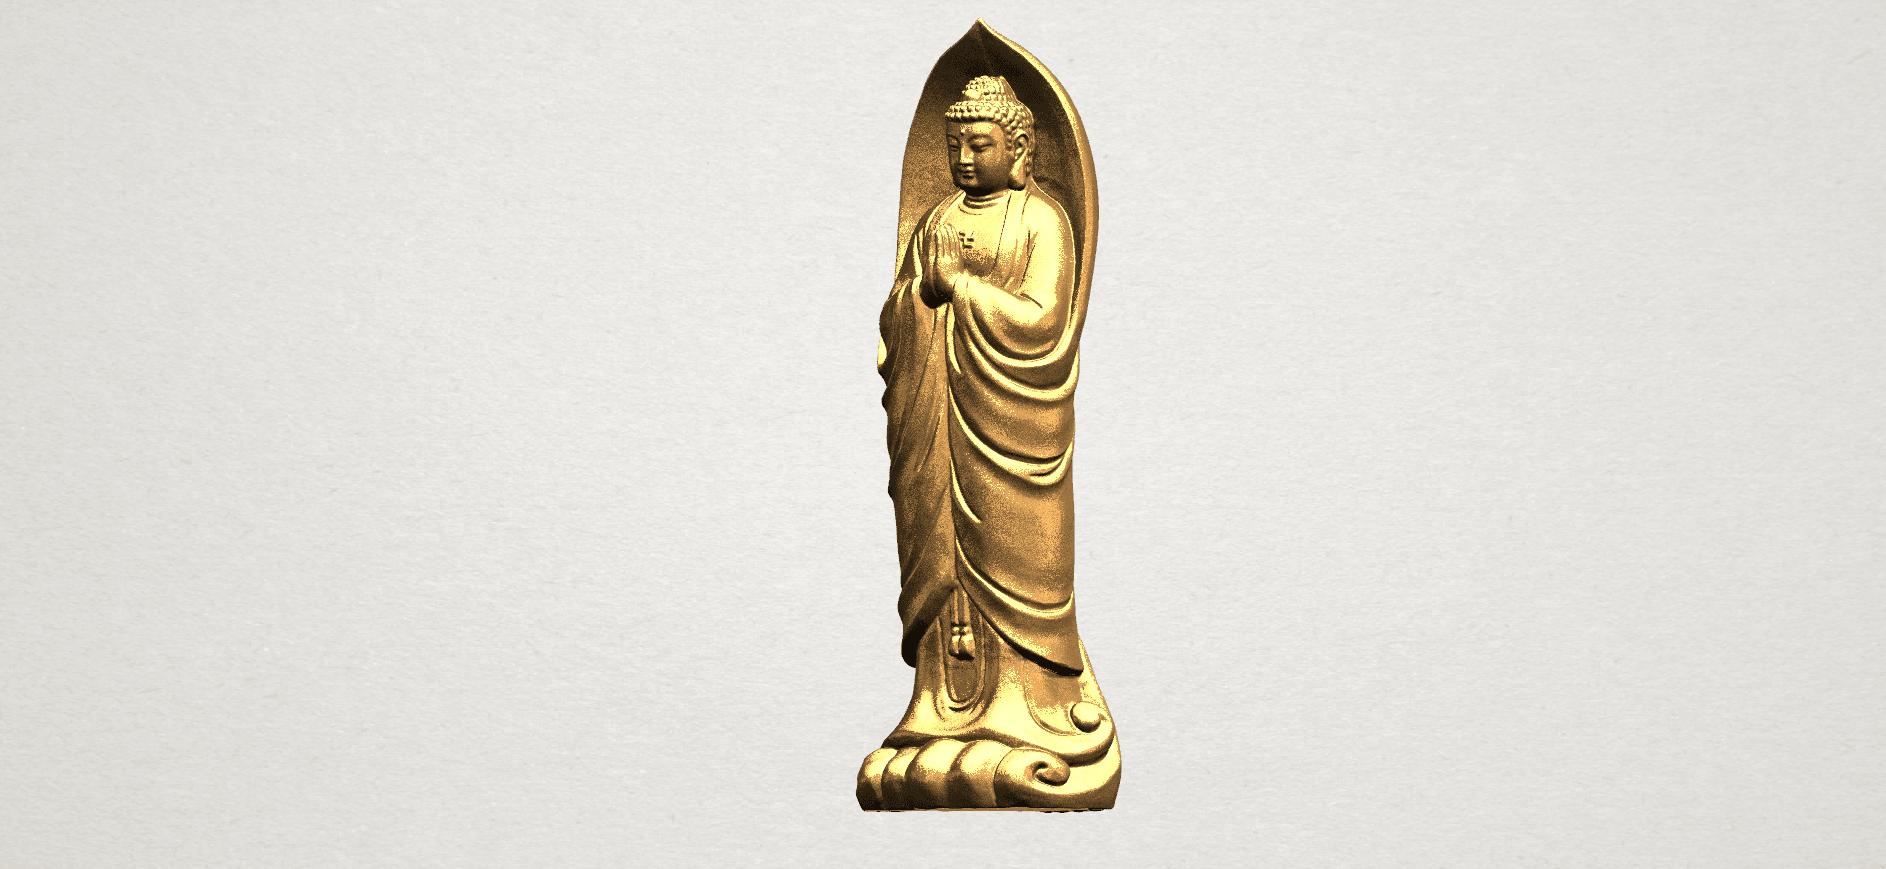 Gautama Buddha Standing (iv) A02.png Download free STL file Gautama Buddha Standing 04 • 3D printable design, GeorgesNikkei